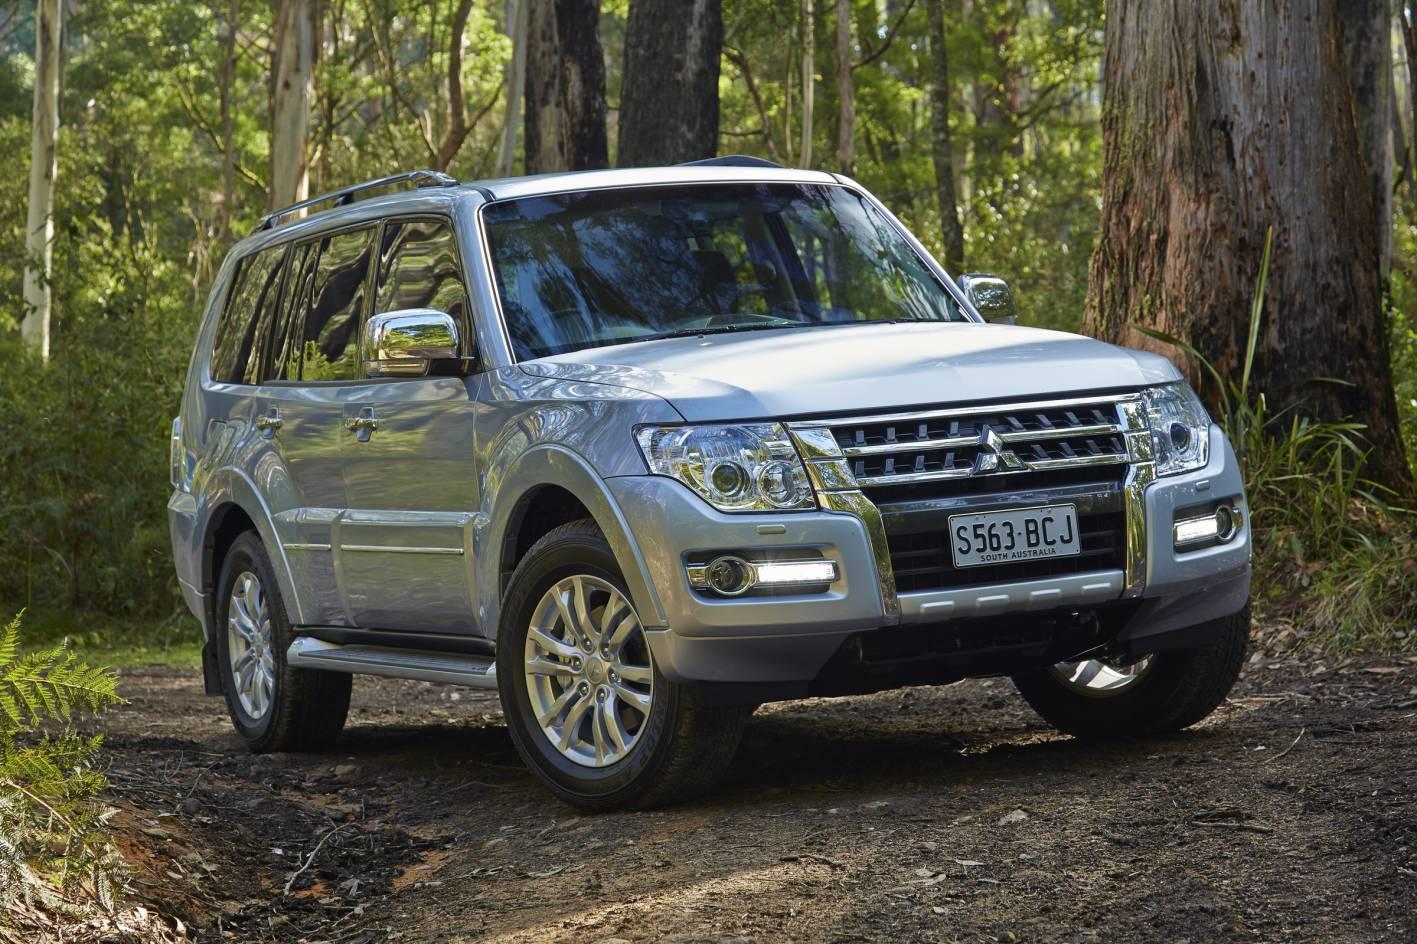 Should I Buy the Mitsubishi Pajero or Toyota Prado? — Auto Expert by